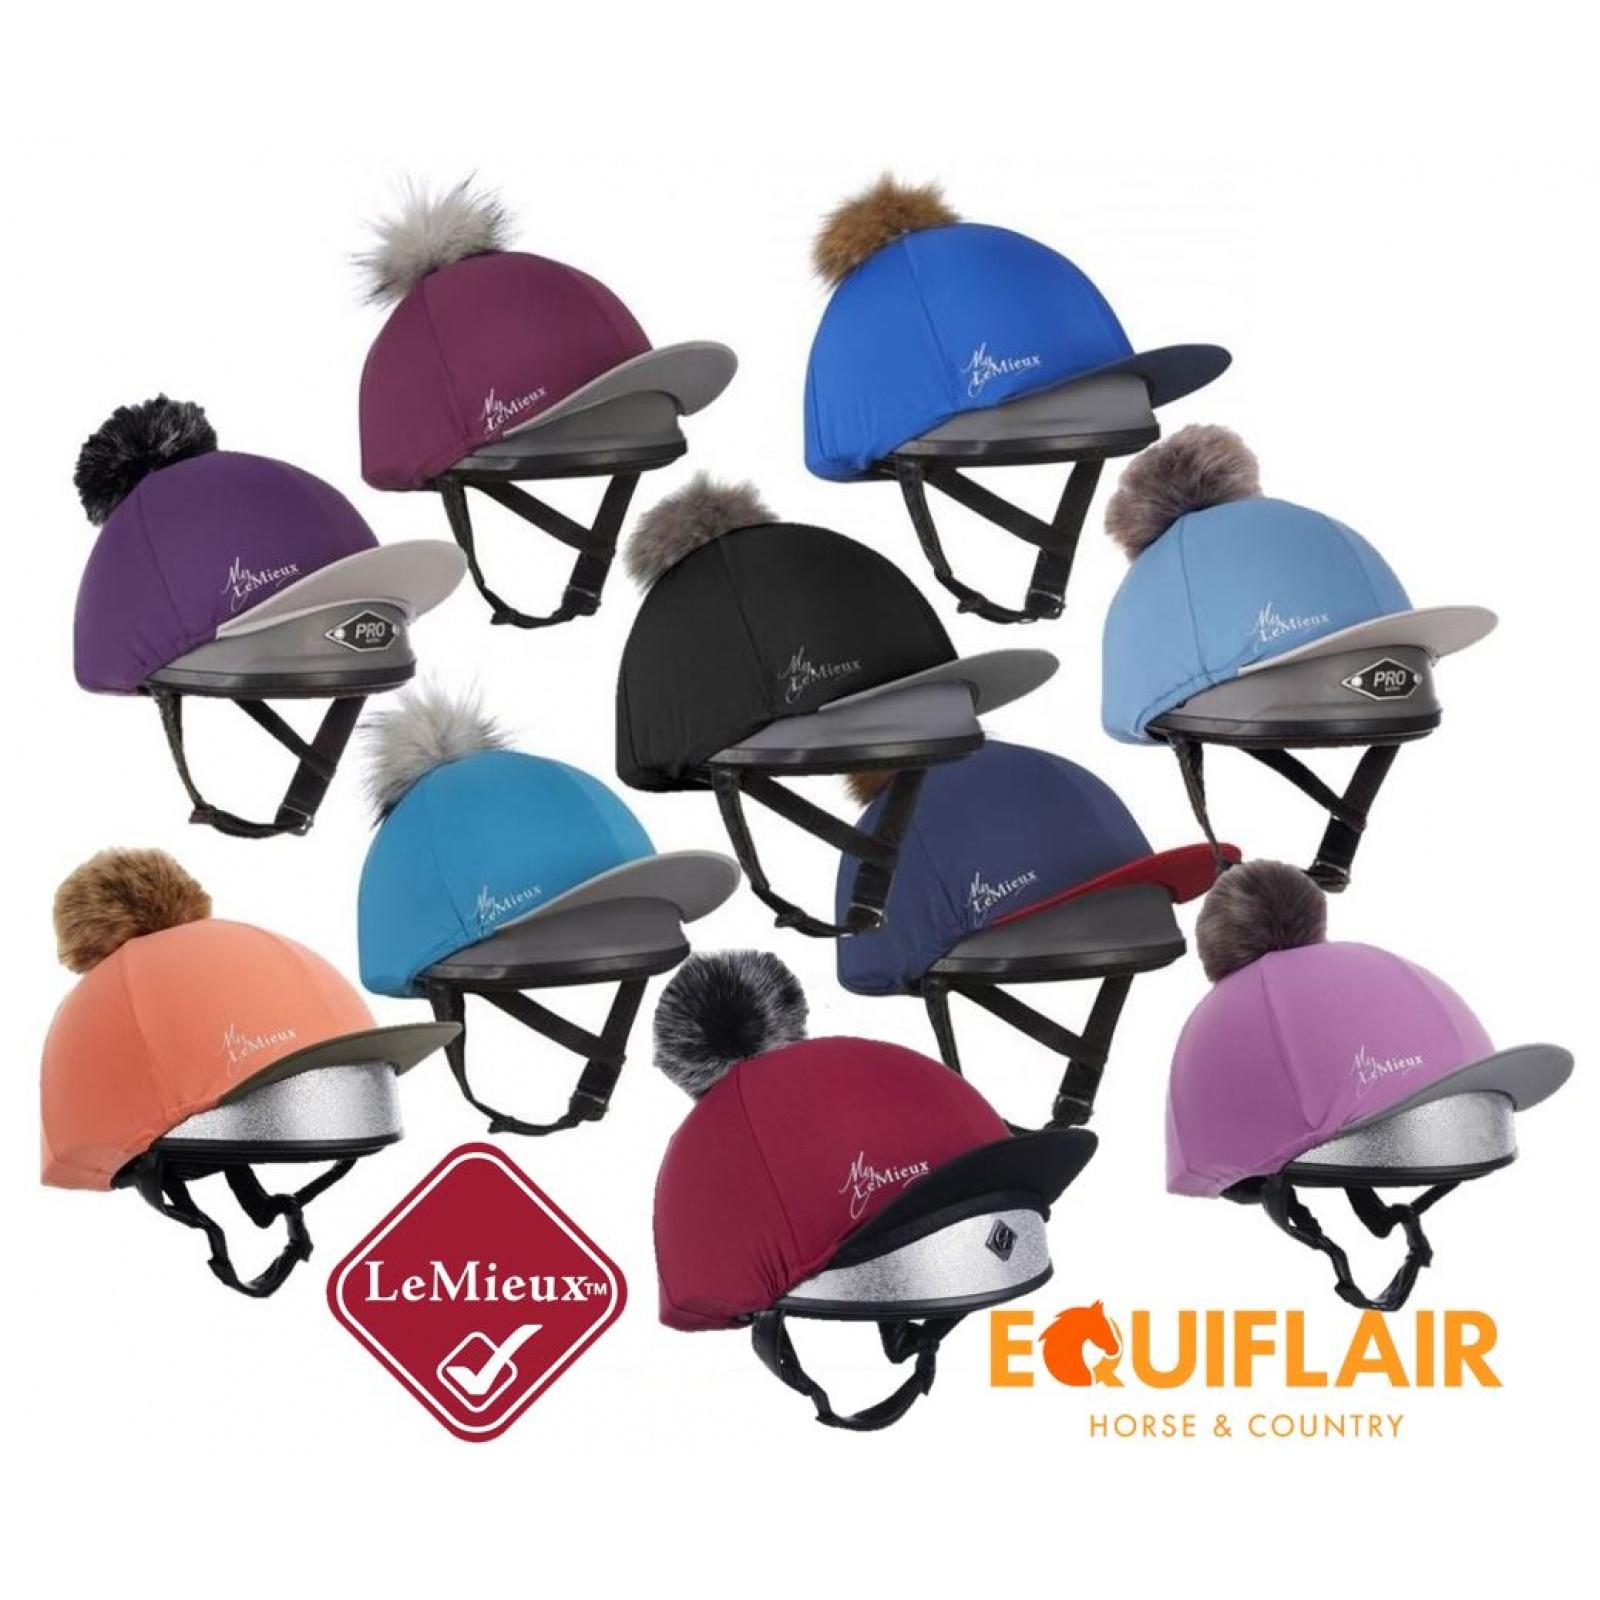 My-LeMieux-Hat-Silk-with-Detachable-Faux-Fur-Pom-Pom miniature 3